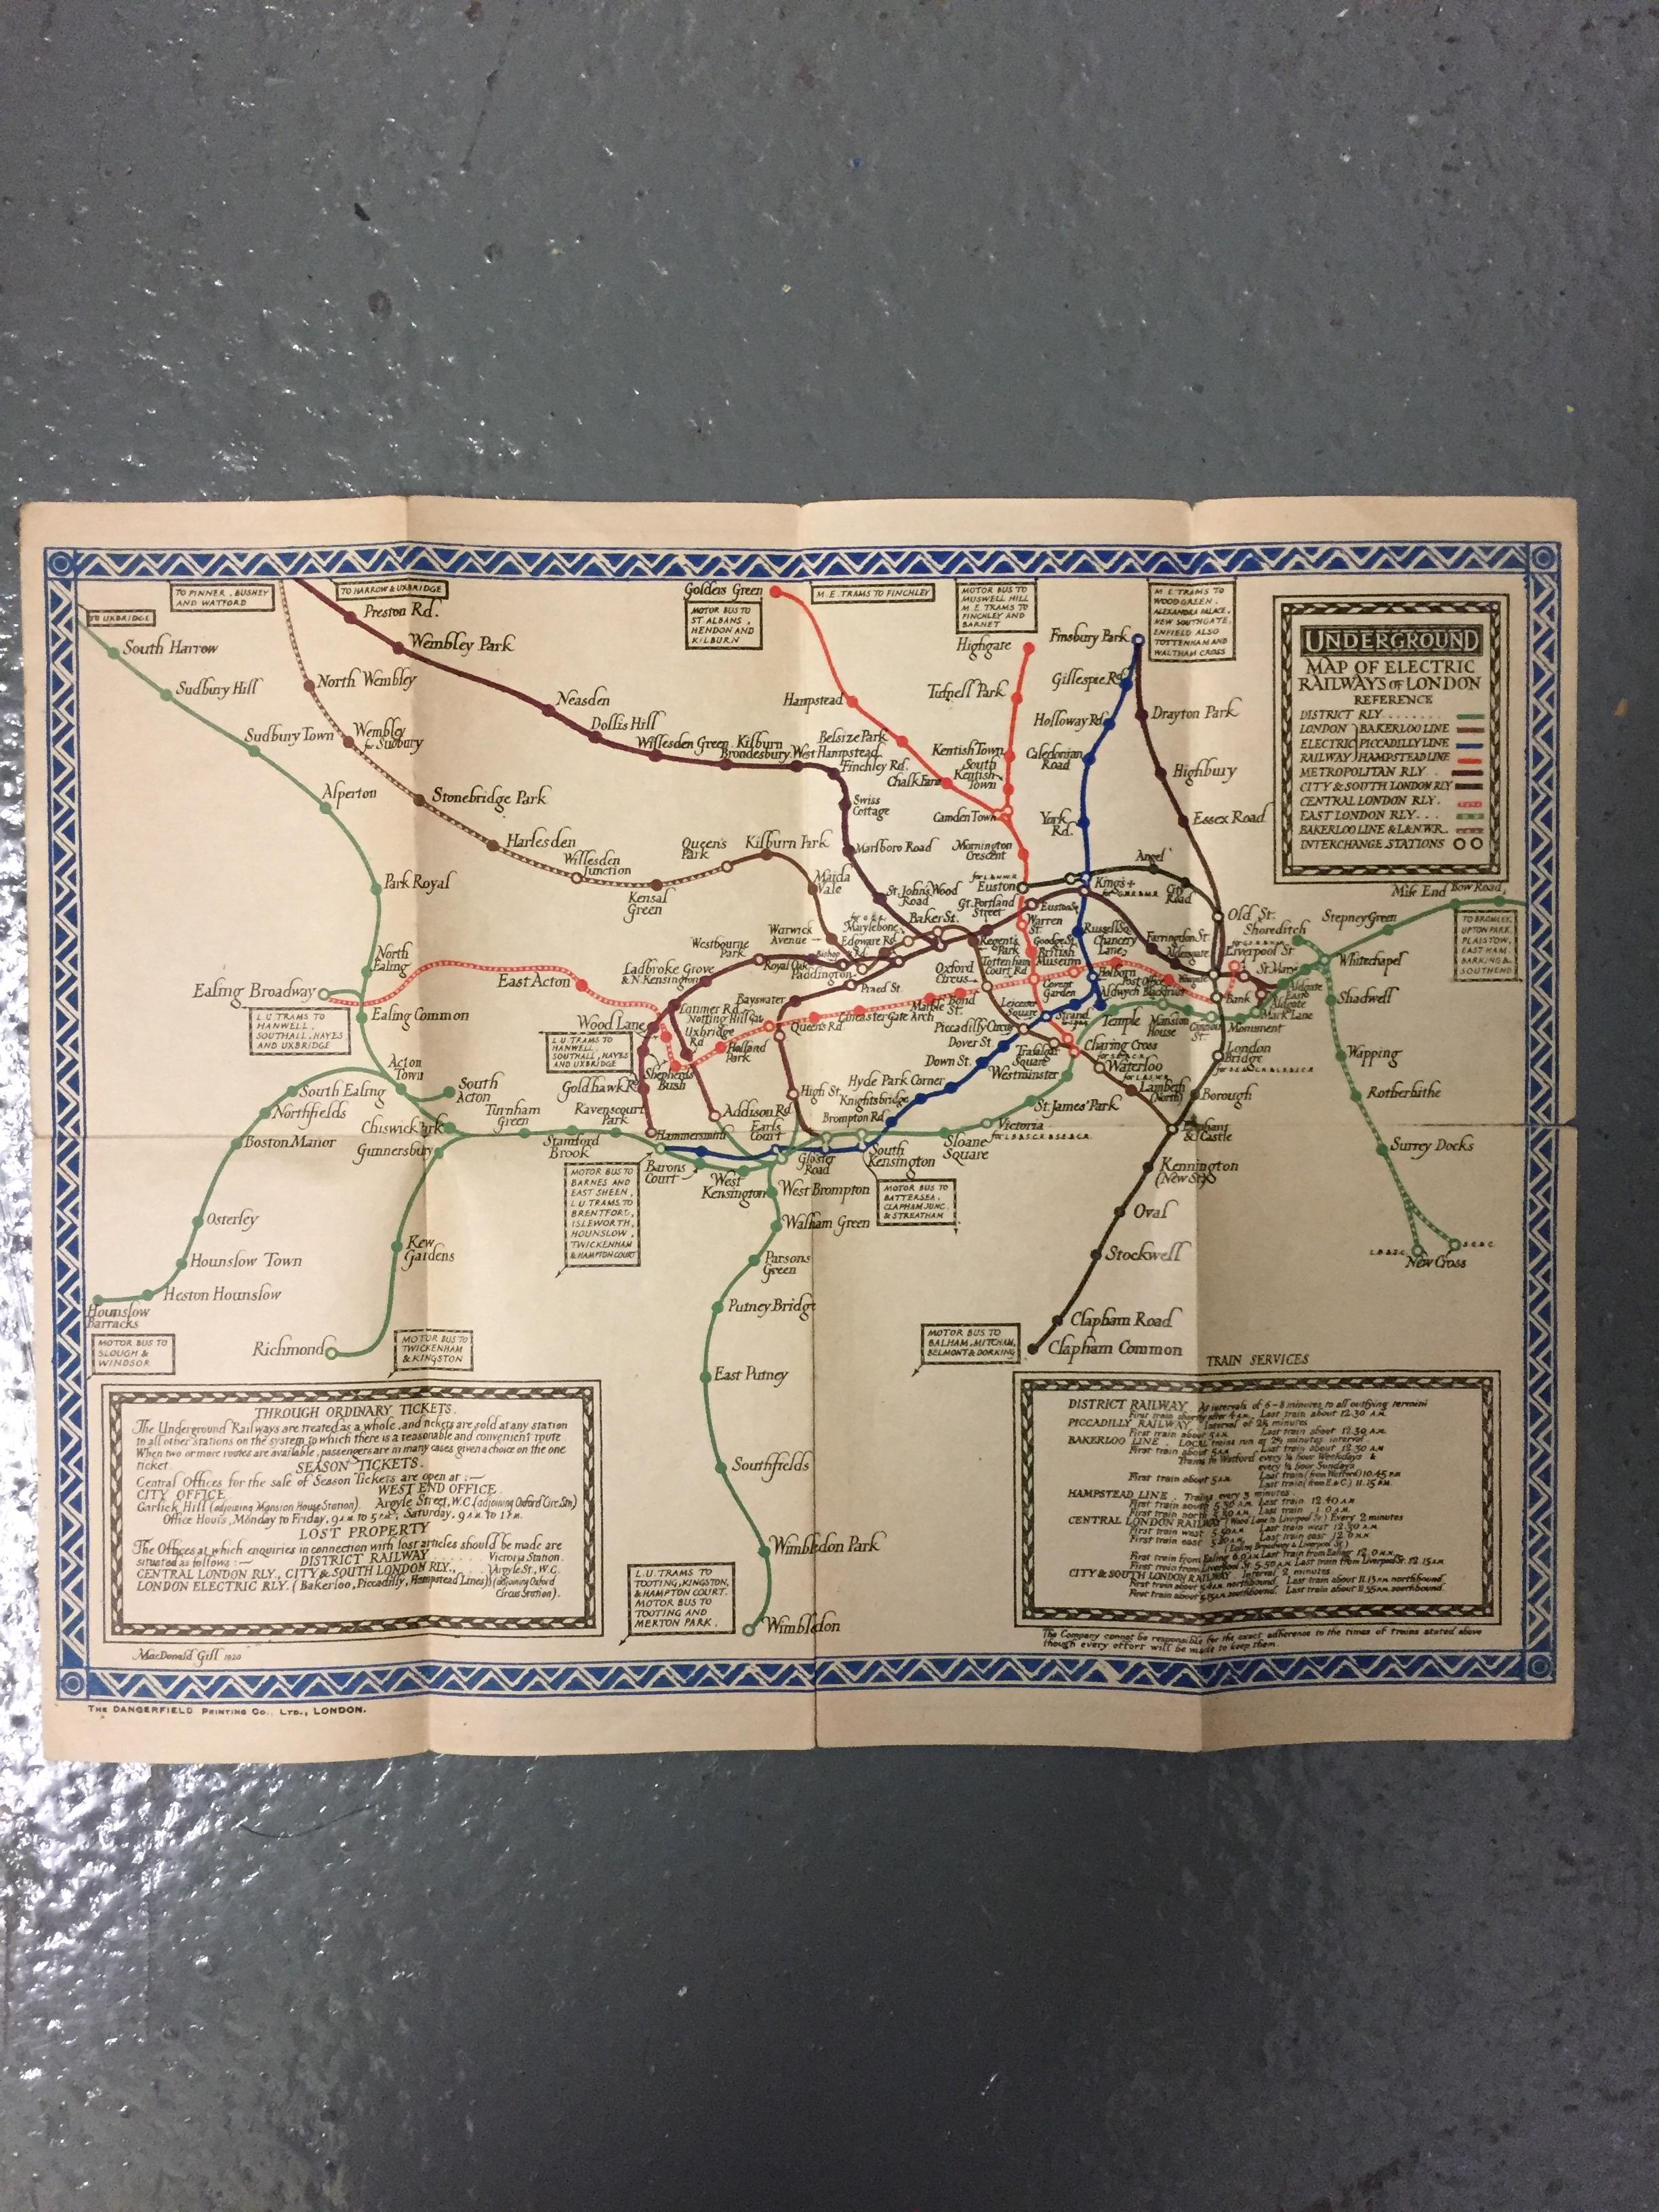 Nine 1910/20s folding pocket maps for London transport,comprising a 1916 General Omnibus Map of some - Image 9 of 15